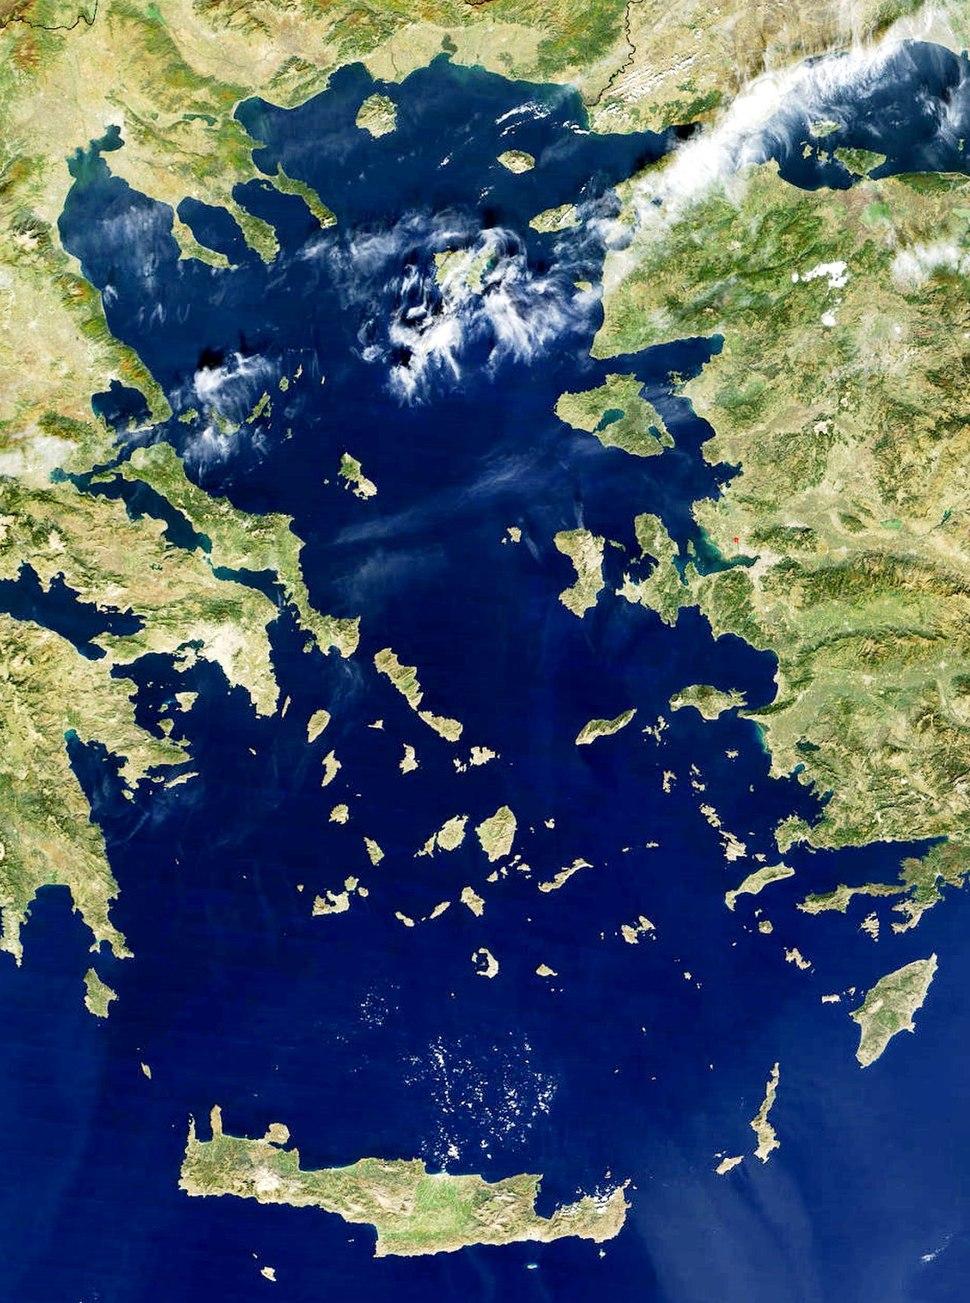 Aegeansea